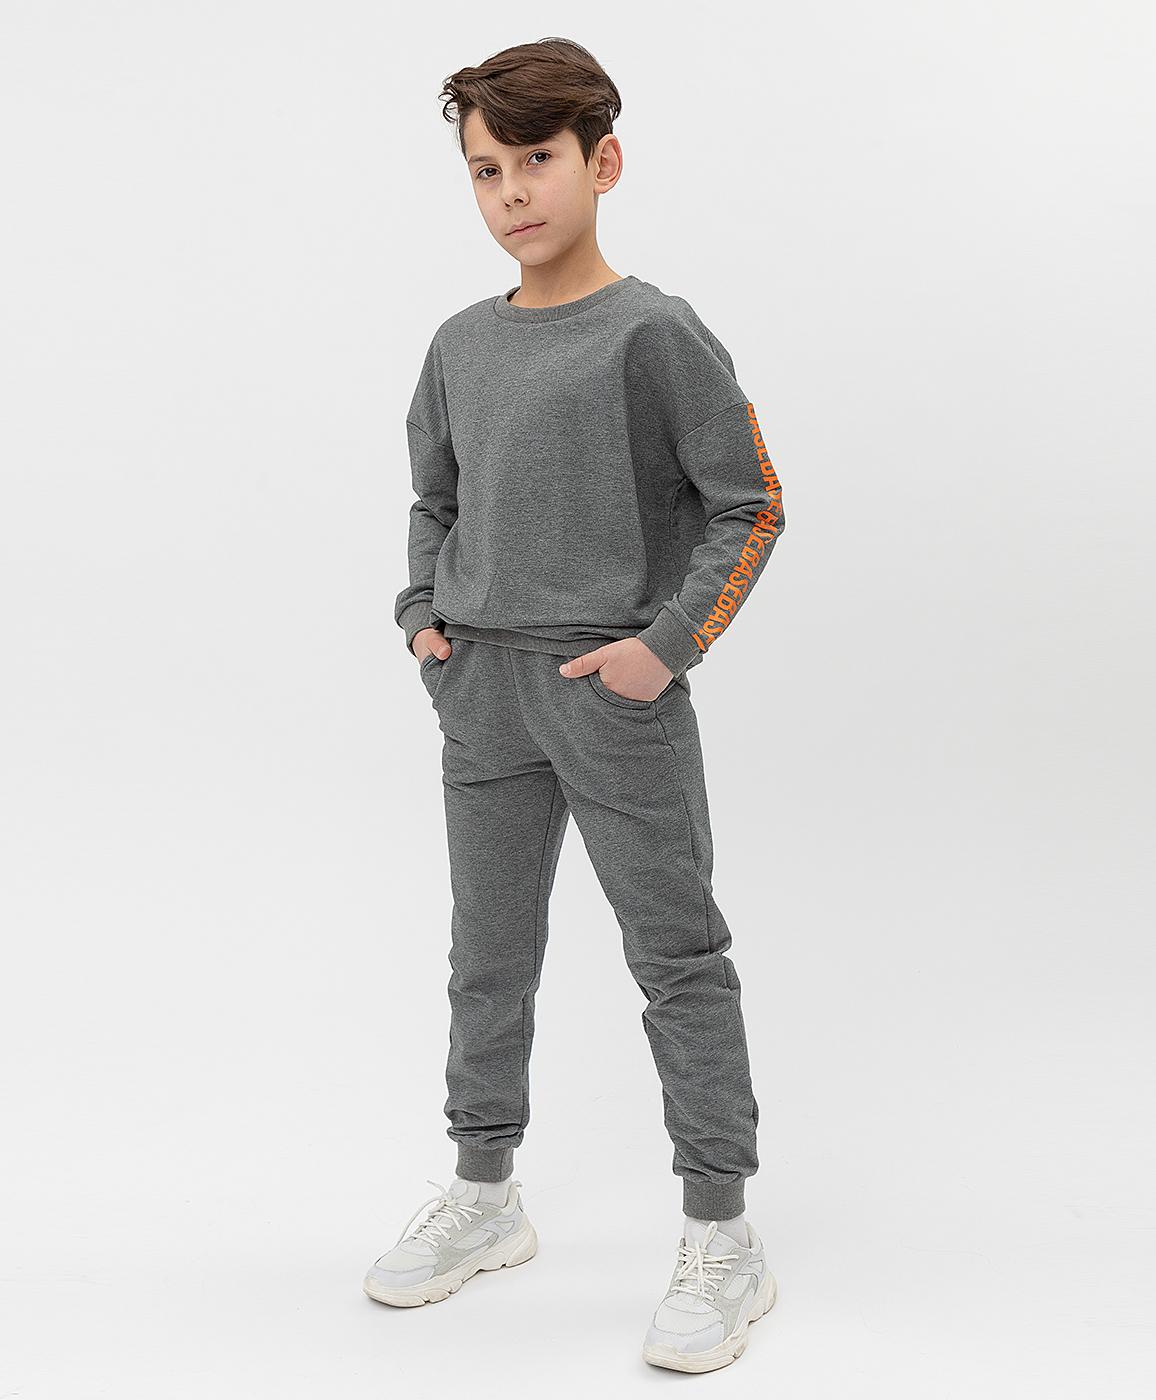 Купить 121BBBB56012300, Серые брюки Button Blue, серый, 134, Футер, Мужской, Весна, ВЕСНА/ЛЕТО 2021 (shop: GulliverMarket Gulliver Market)